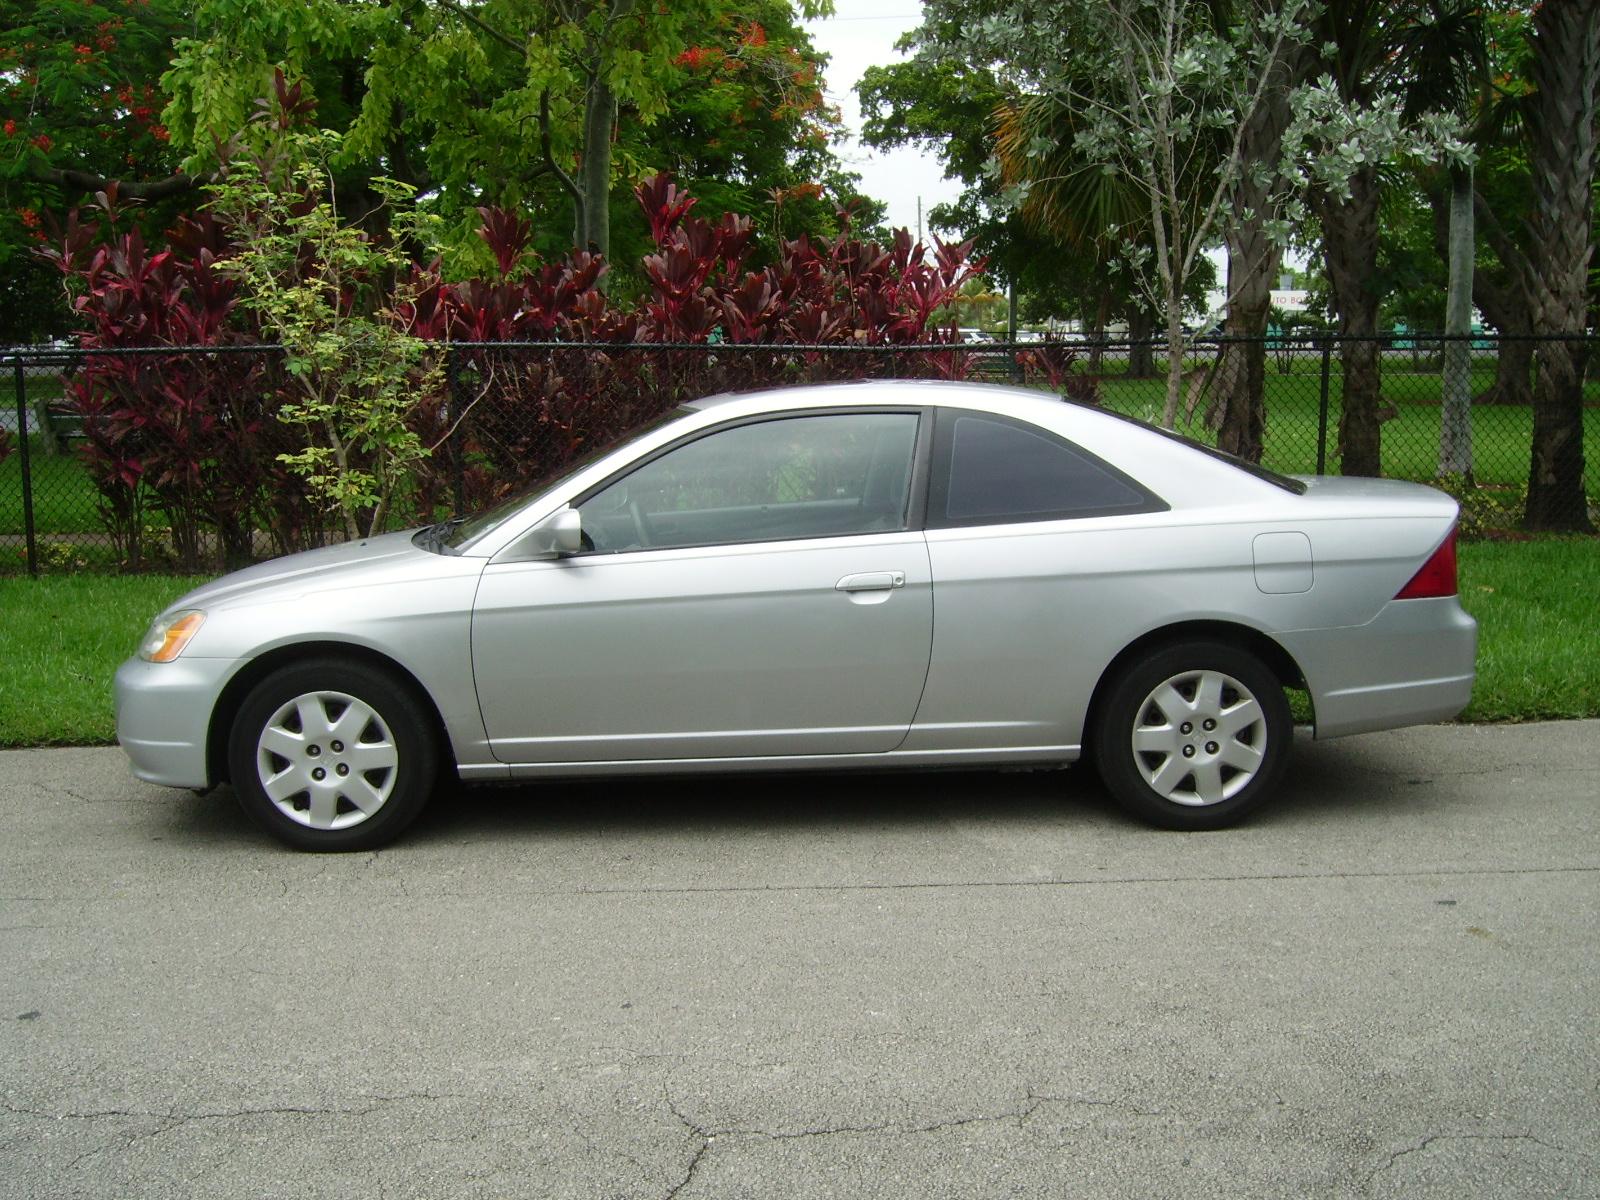 Picture of 2001 Honda Civic EX Coupe, exterior